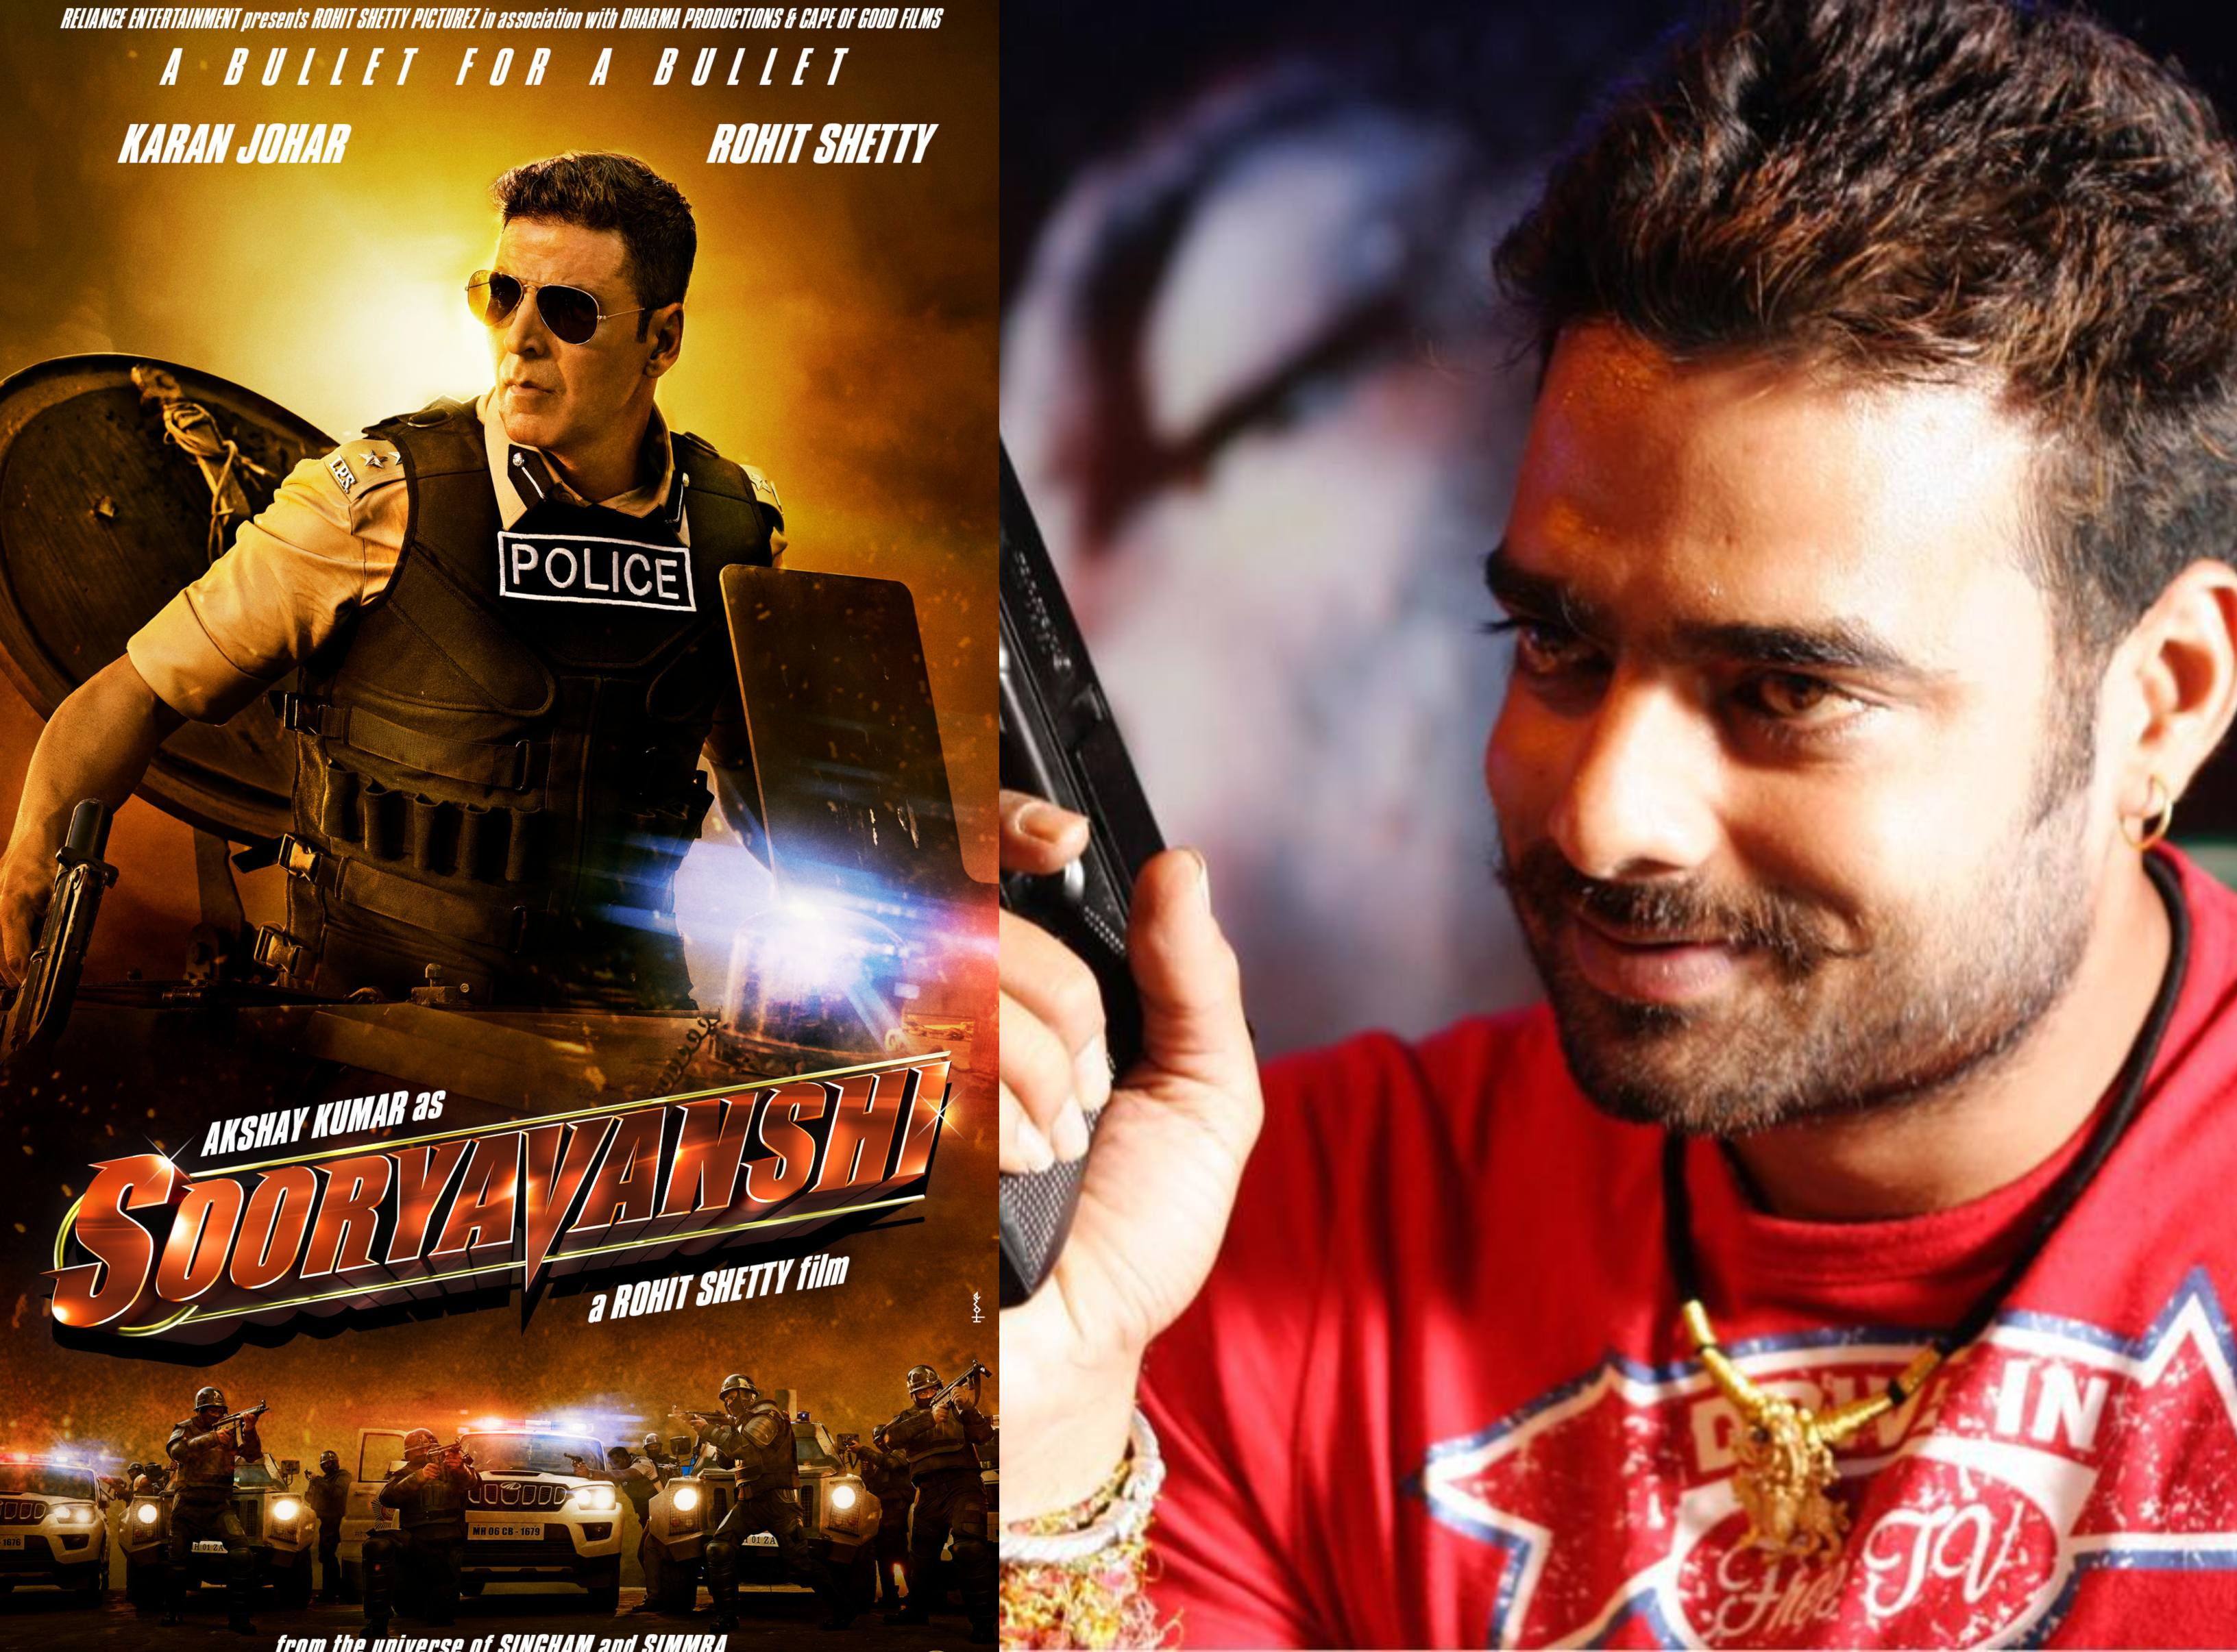 Abhimanyu Singh To Play The Villain In Rohit Shetty's Sooryavanshi